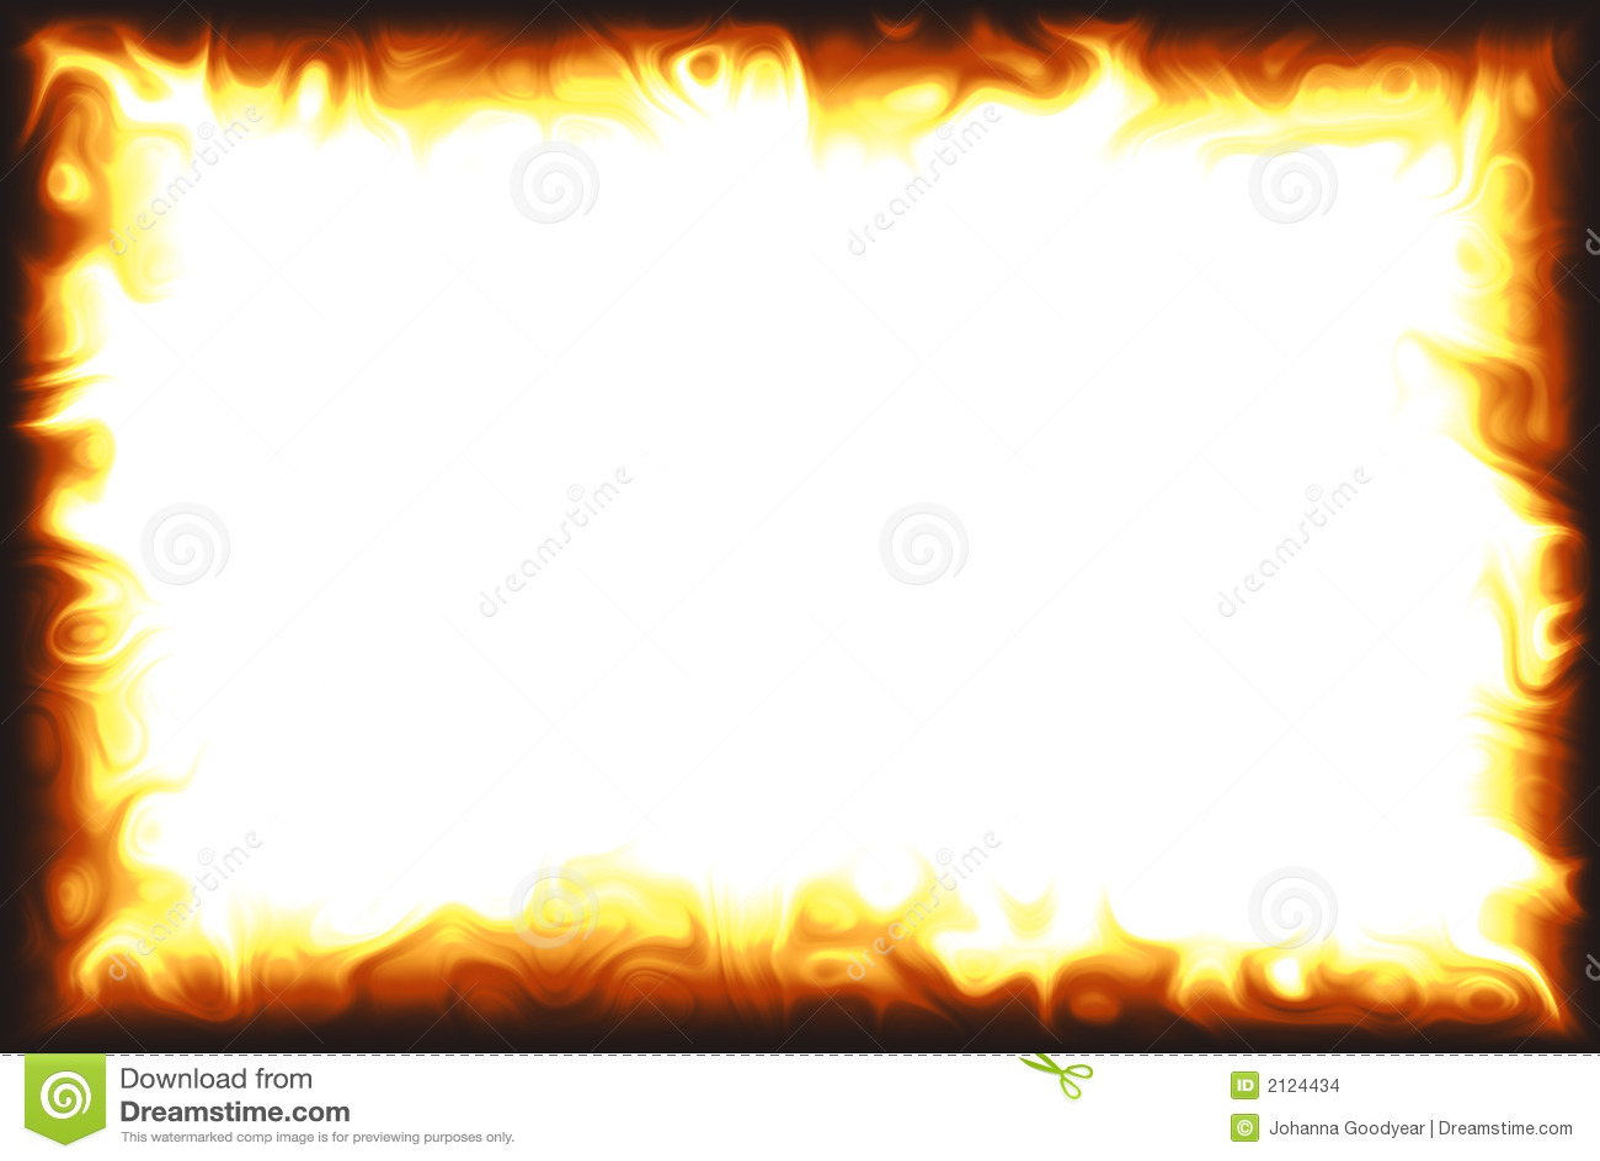 Flame Border stock illustration. Illustration of fire ...